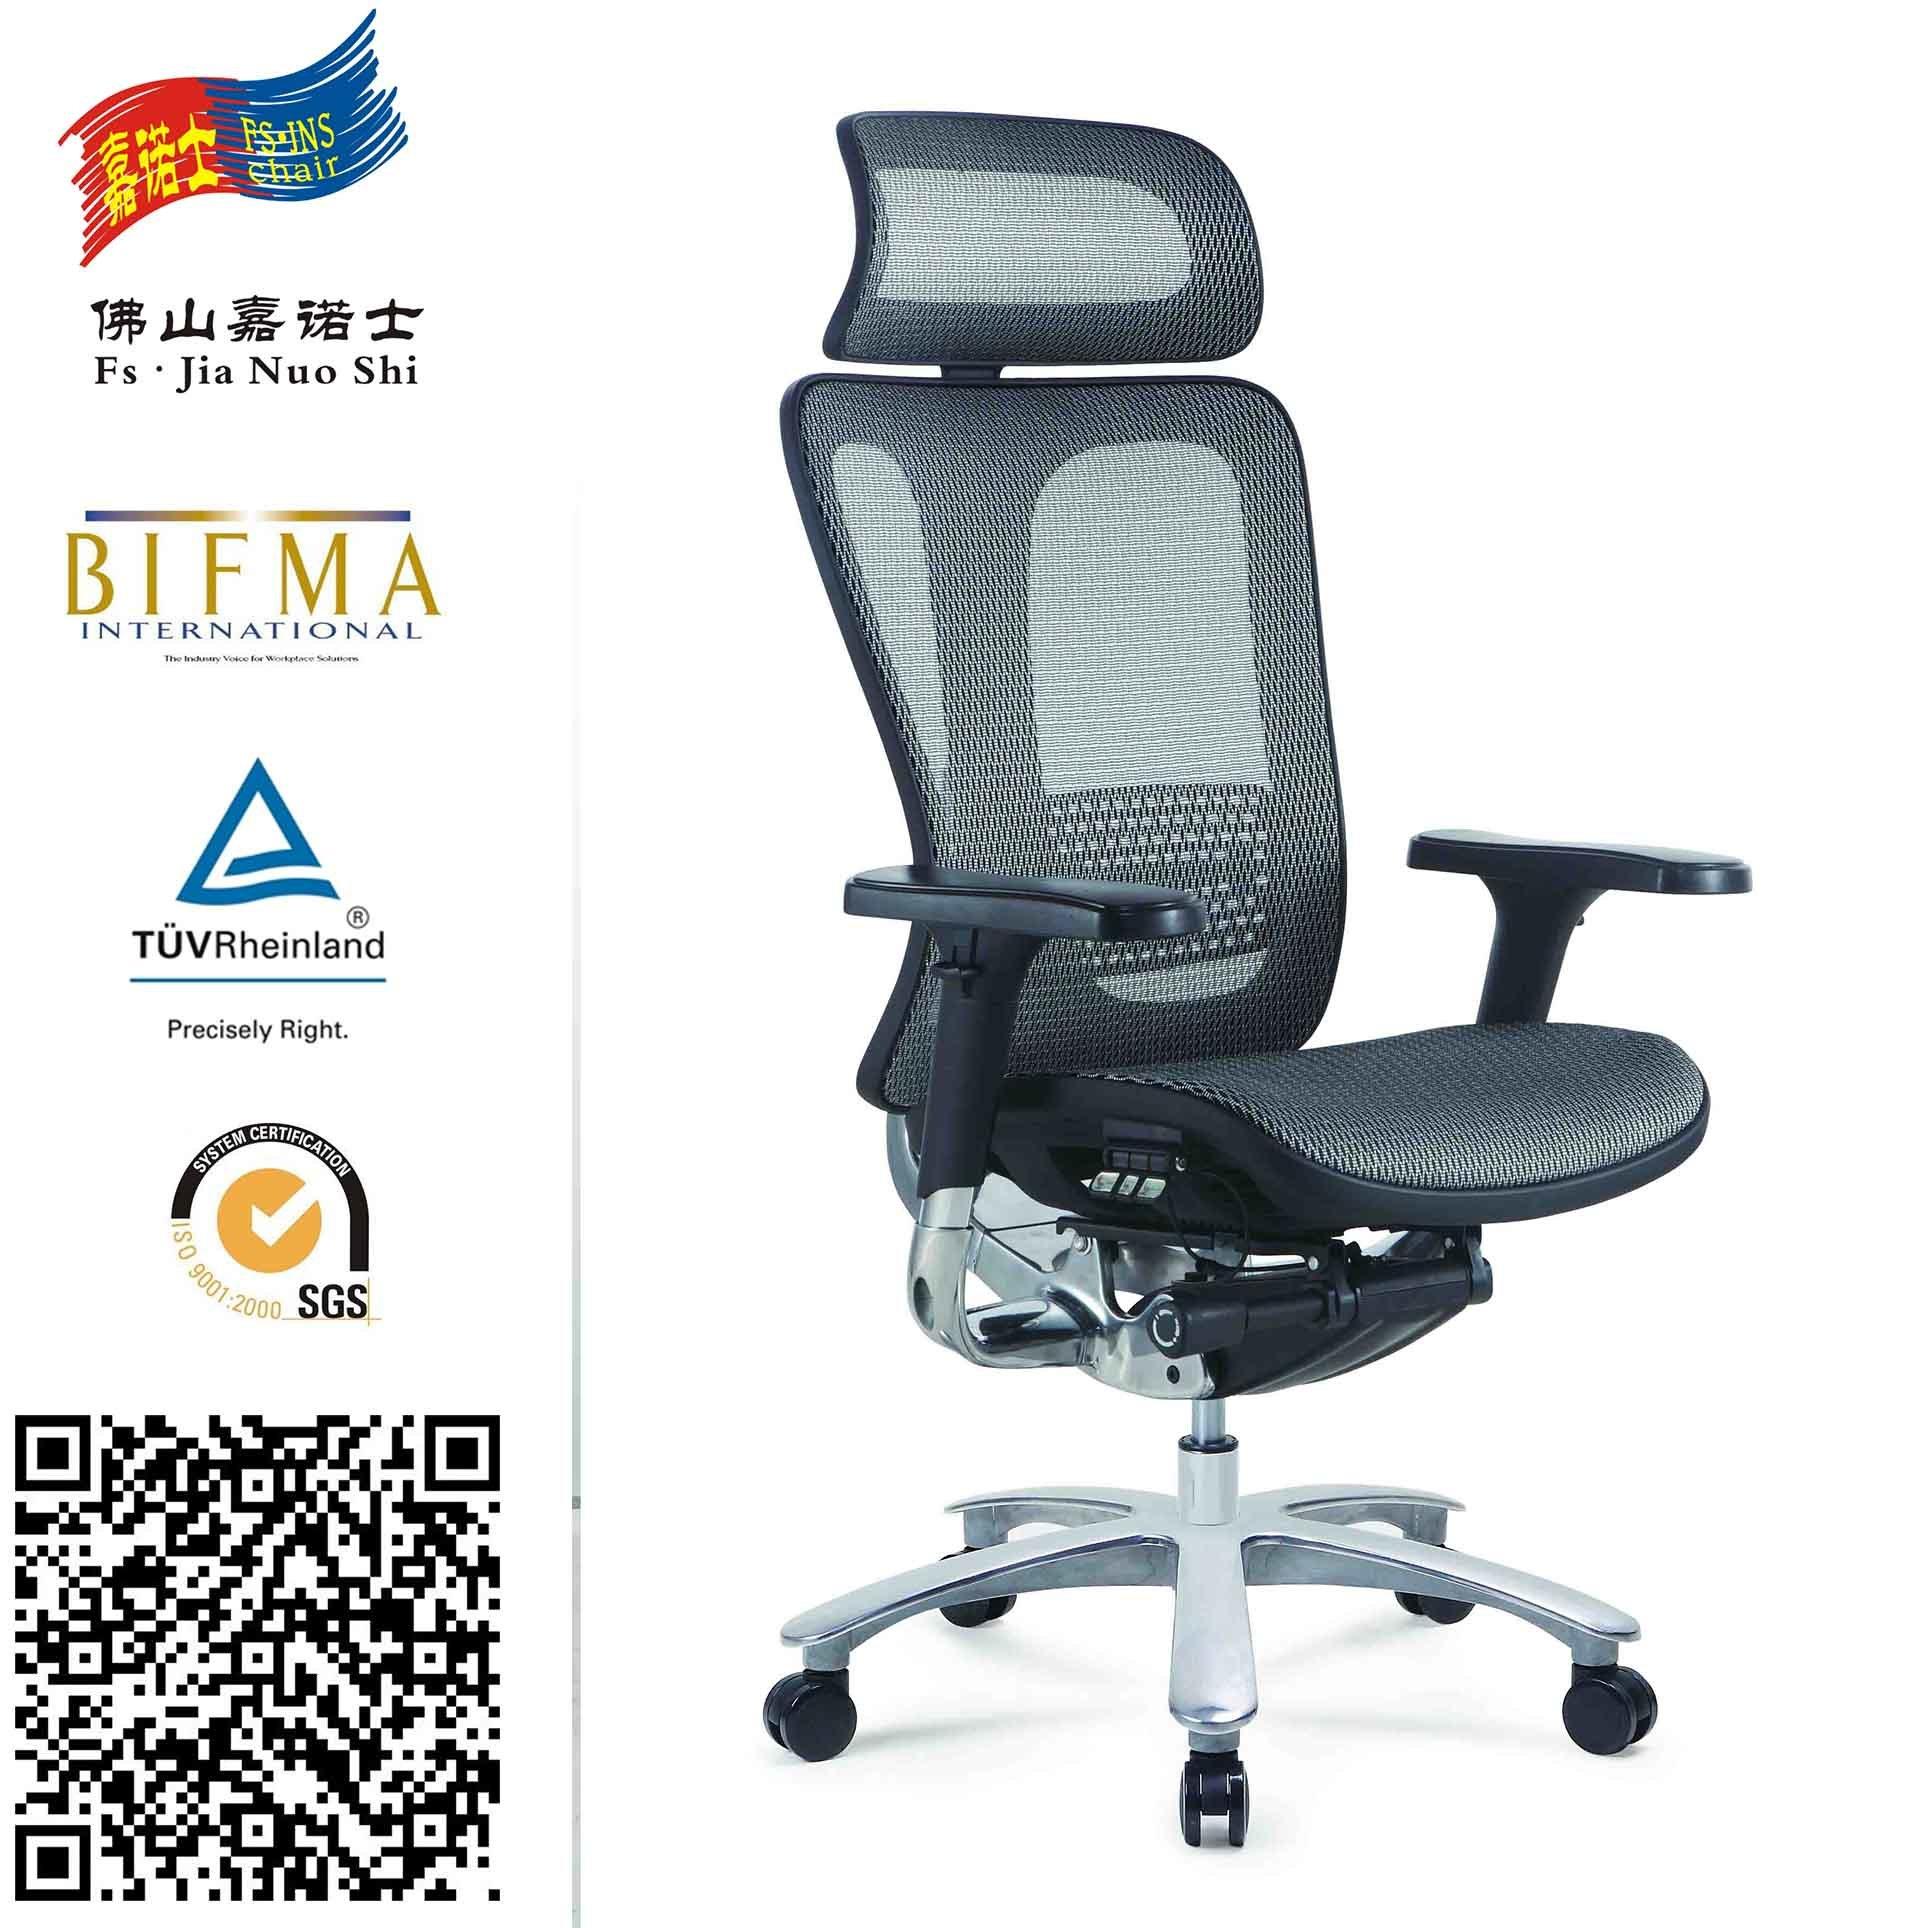 [Hot Item] Jns 5 Years Warranty Adjustable Mesh Dxracer Chair